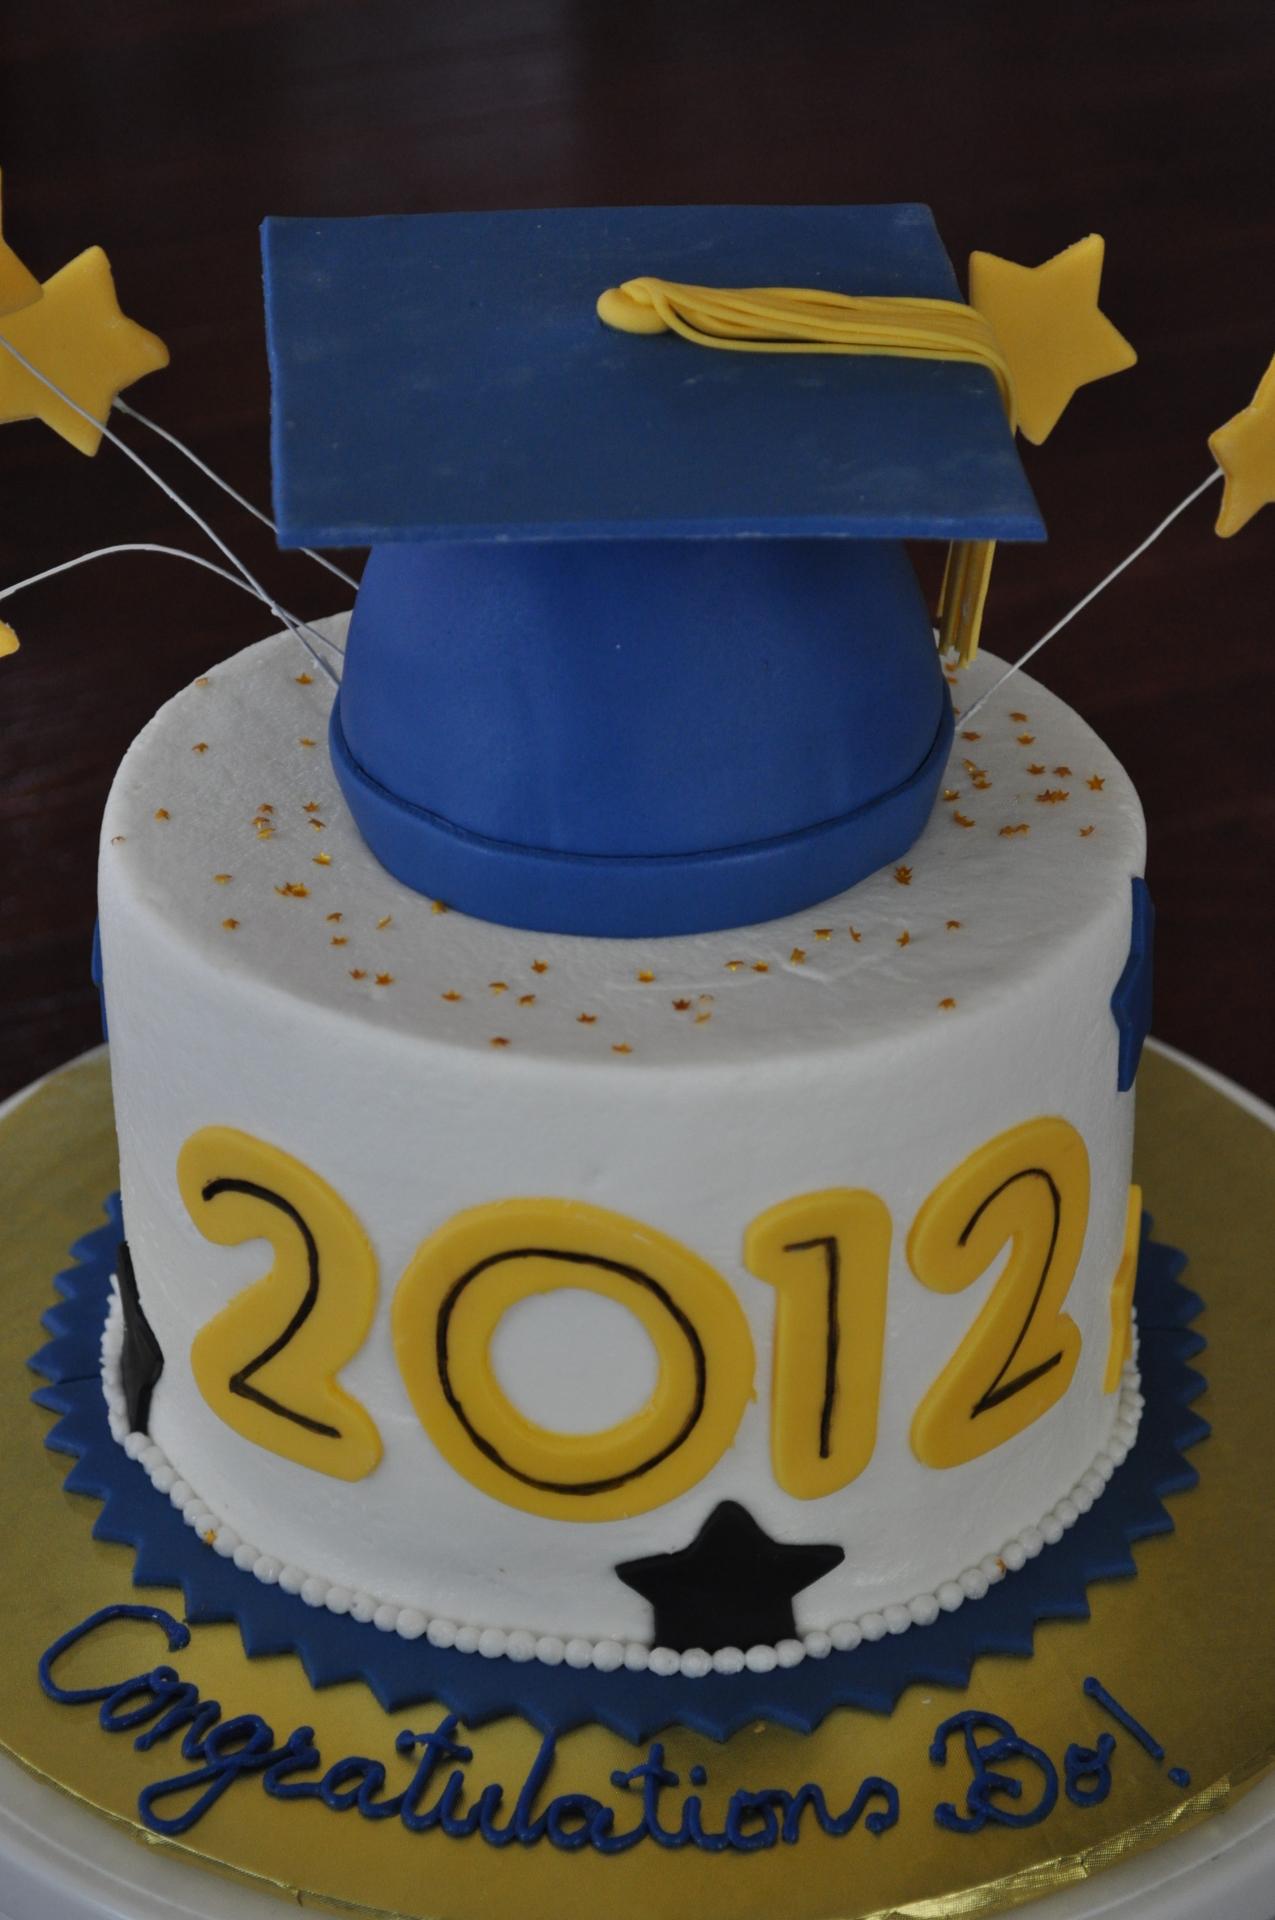 Grauation hat cake